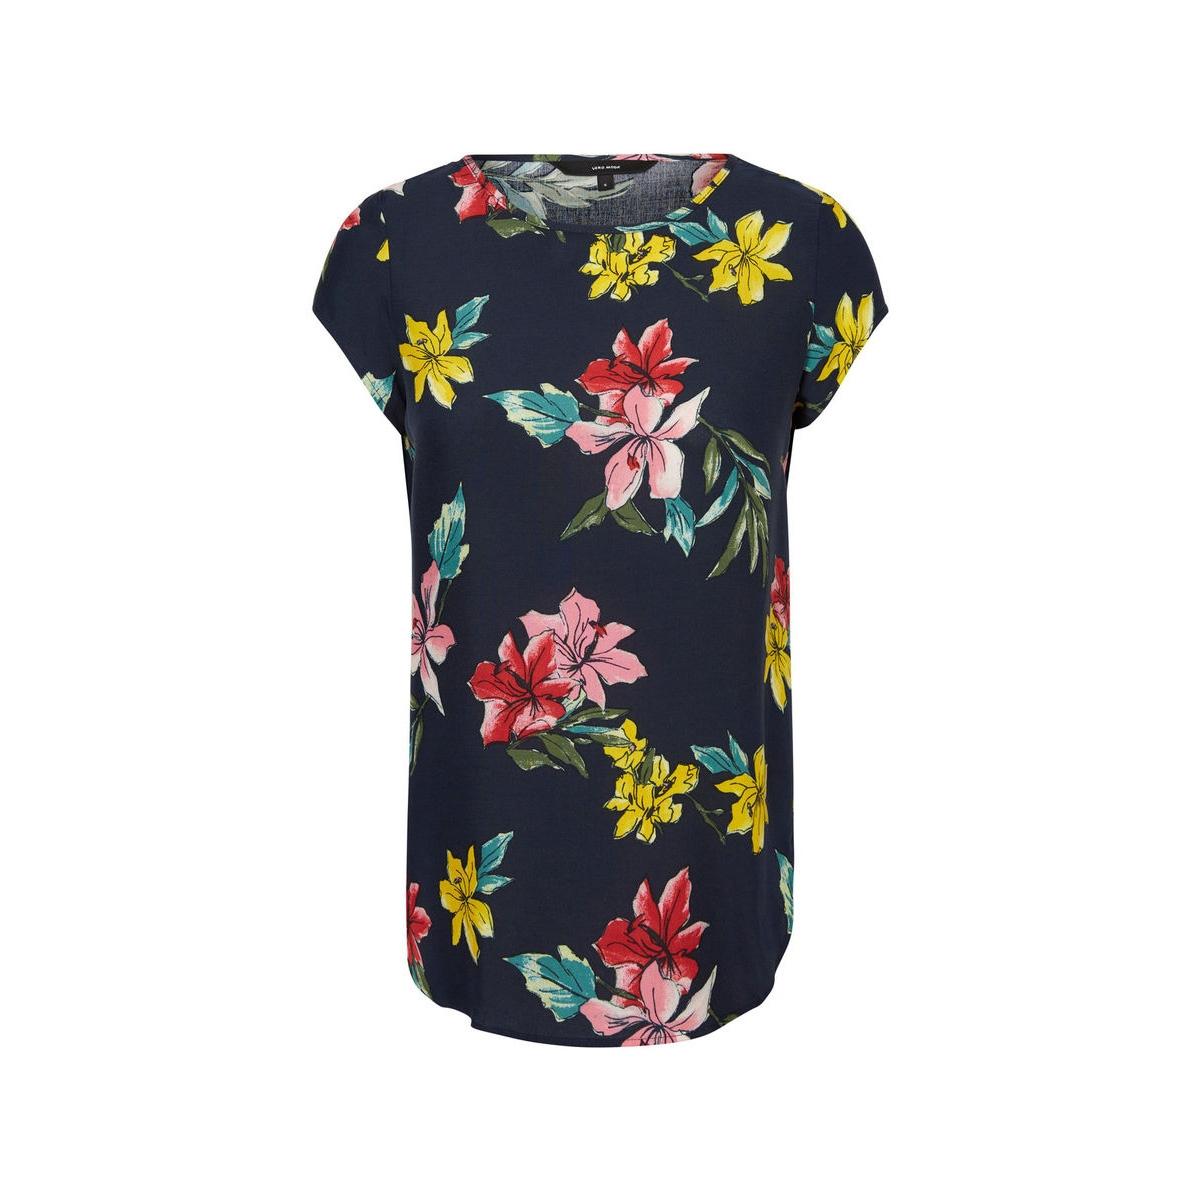 vmboca ss blouse multi printed 10132802 vero moda t-shirt navy blazer/kayla